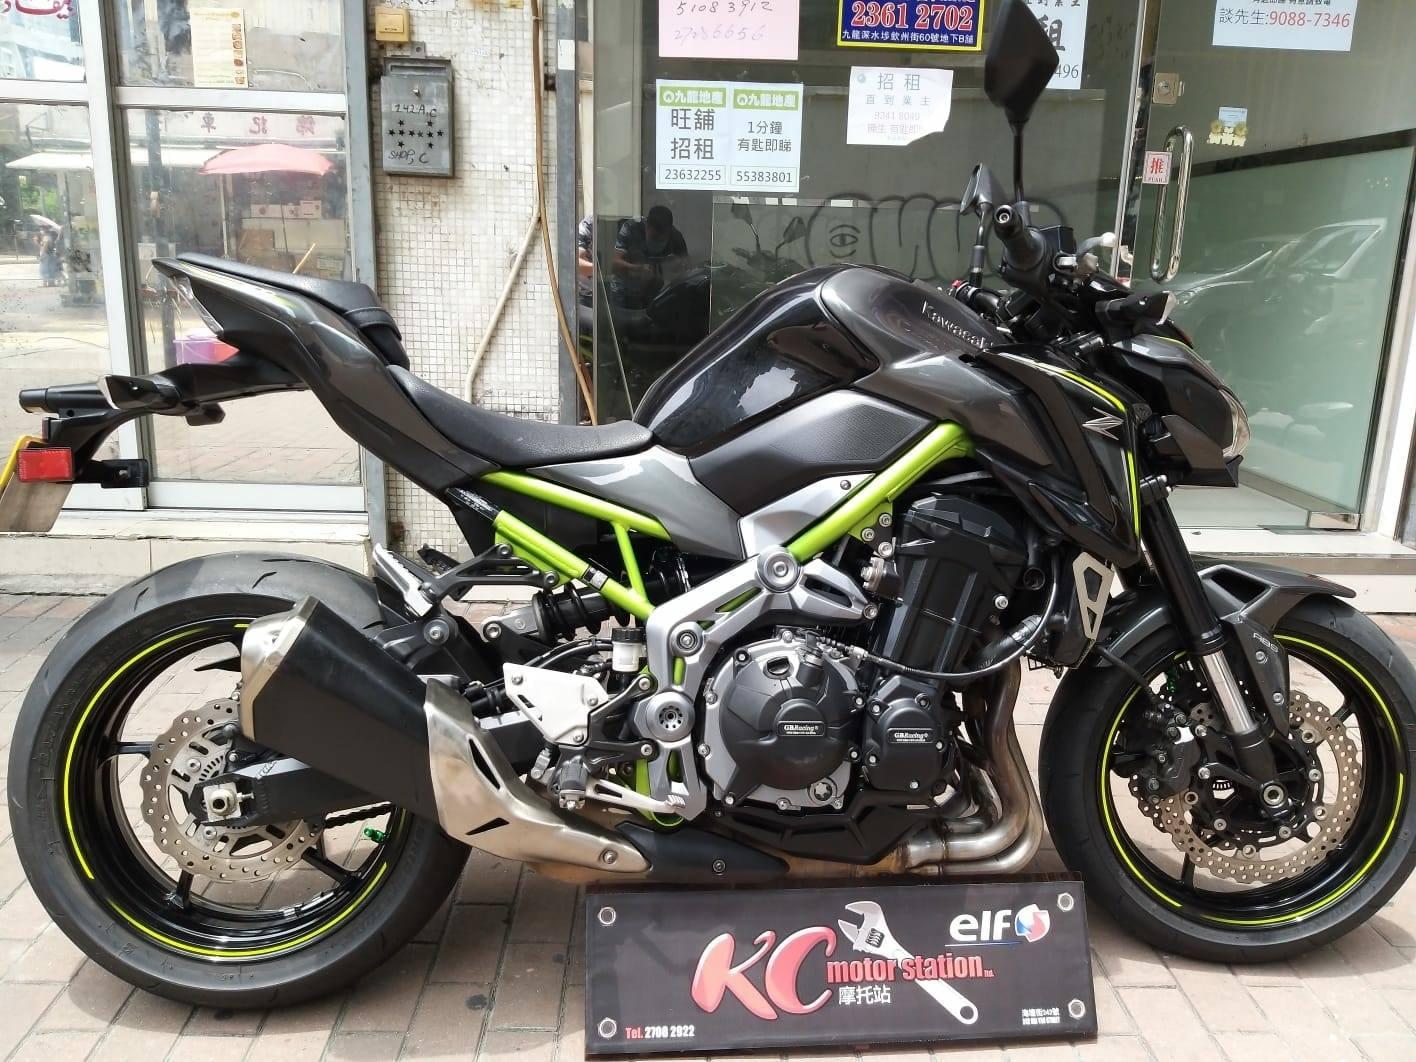 KAWASAKI Z900 2018    -「Webike摩托車市」